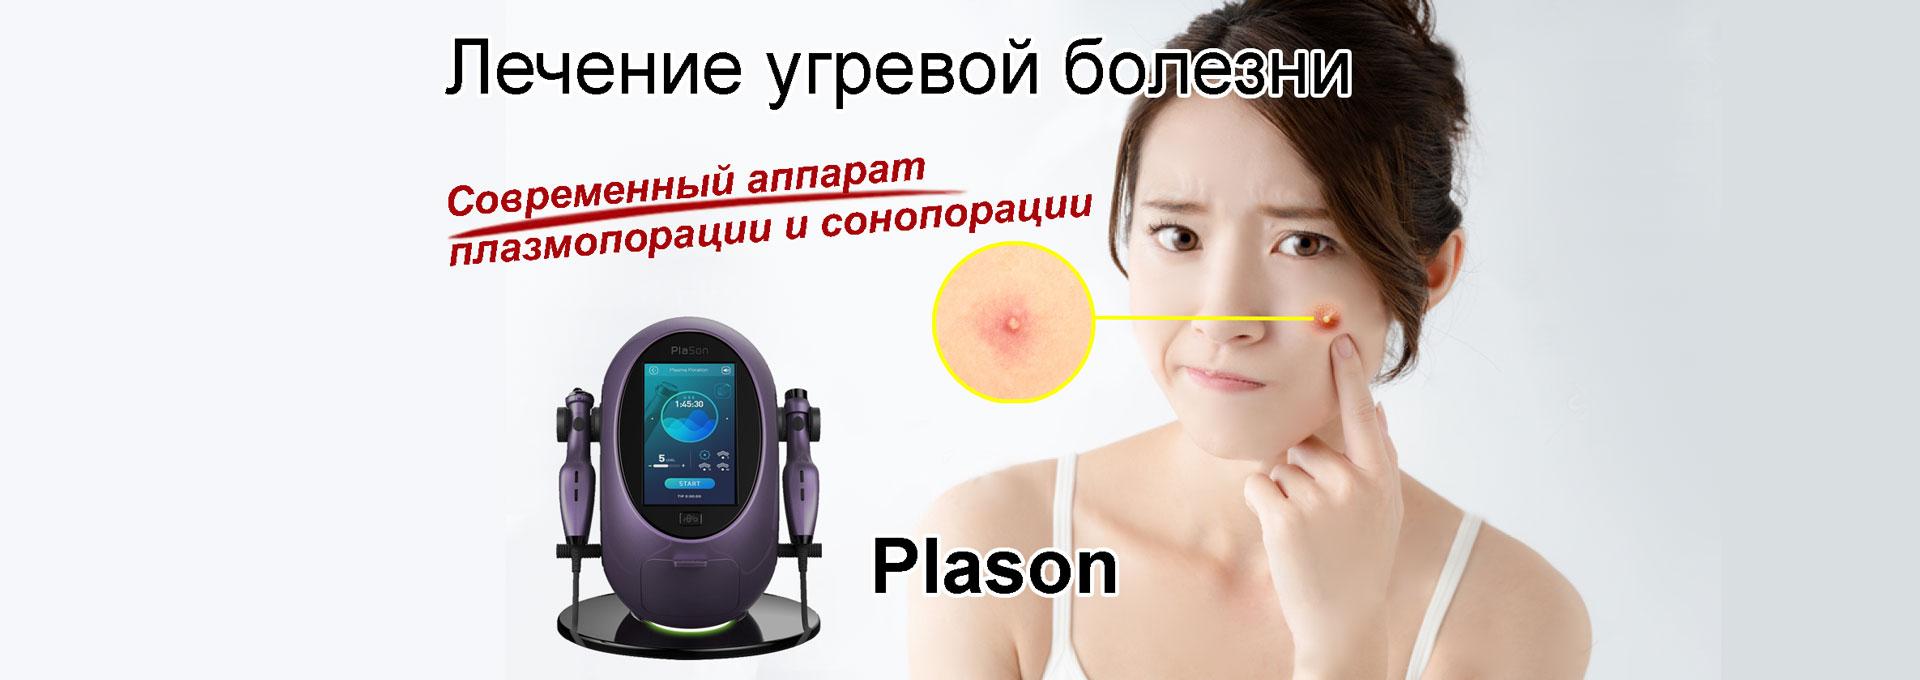 Acne-treatment-koreanmed-almaty-plason